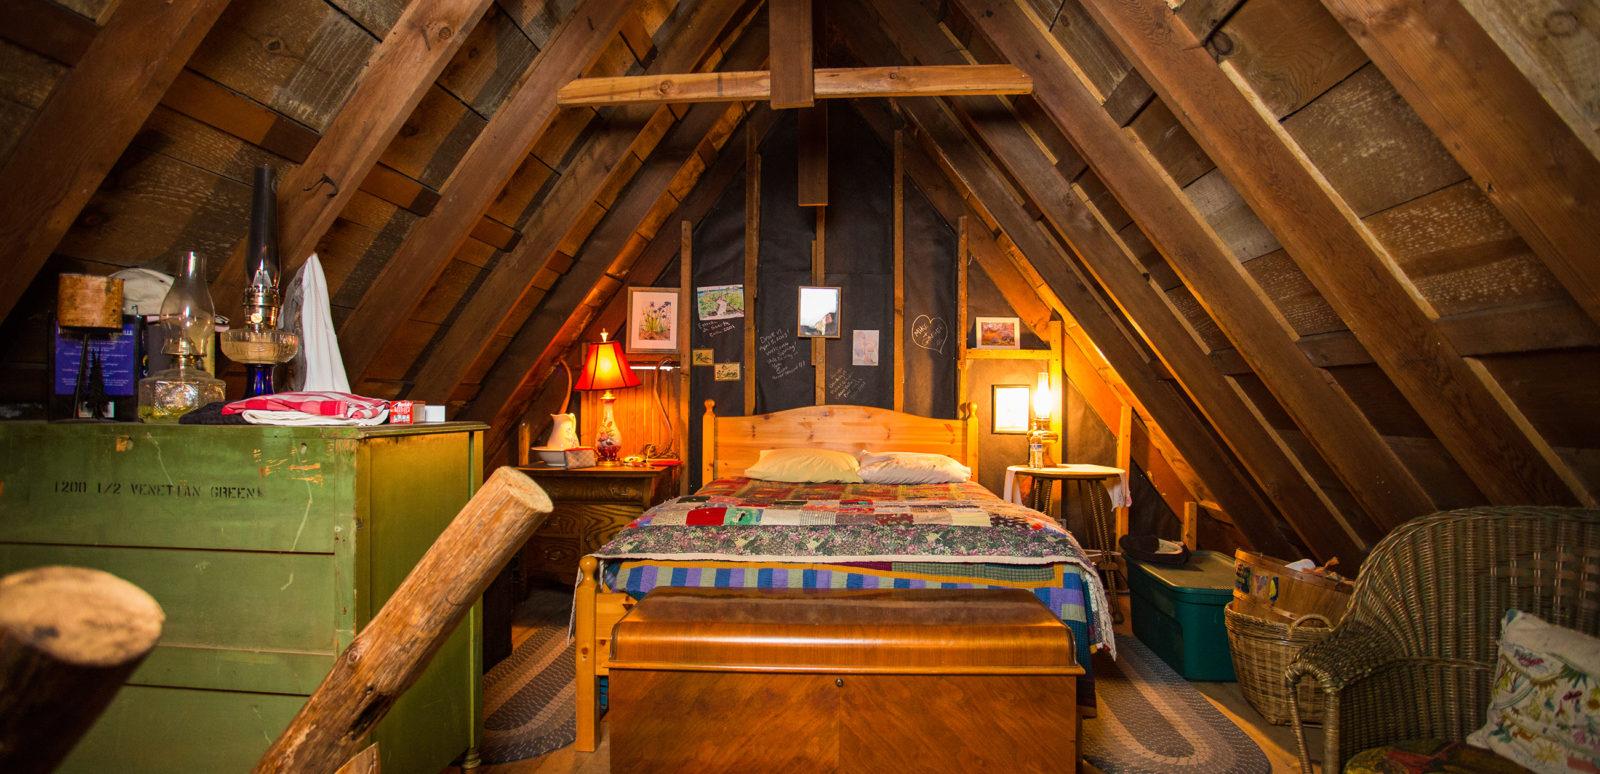 Lodges & Cabins